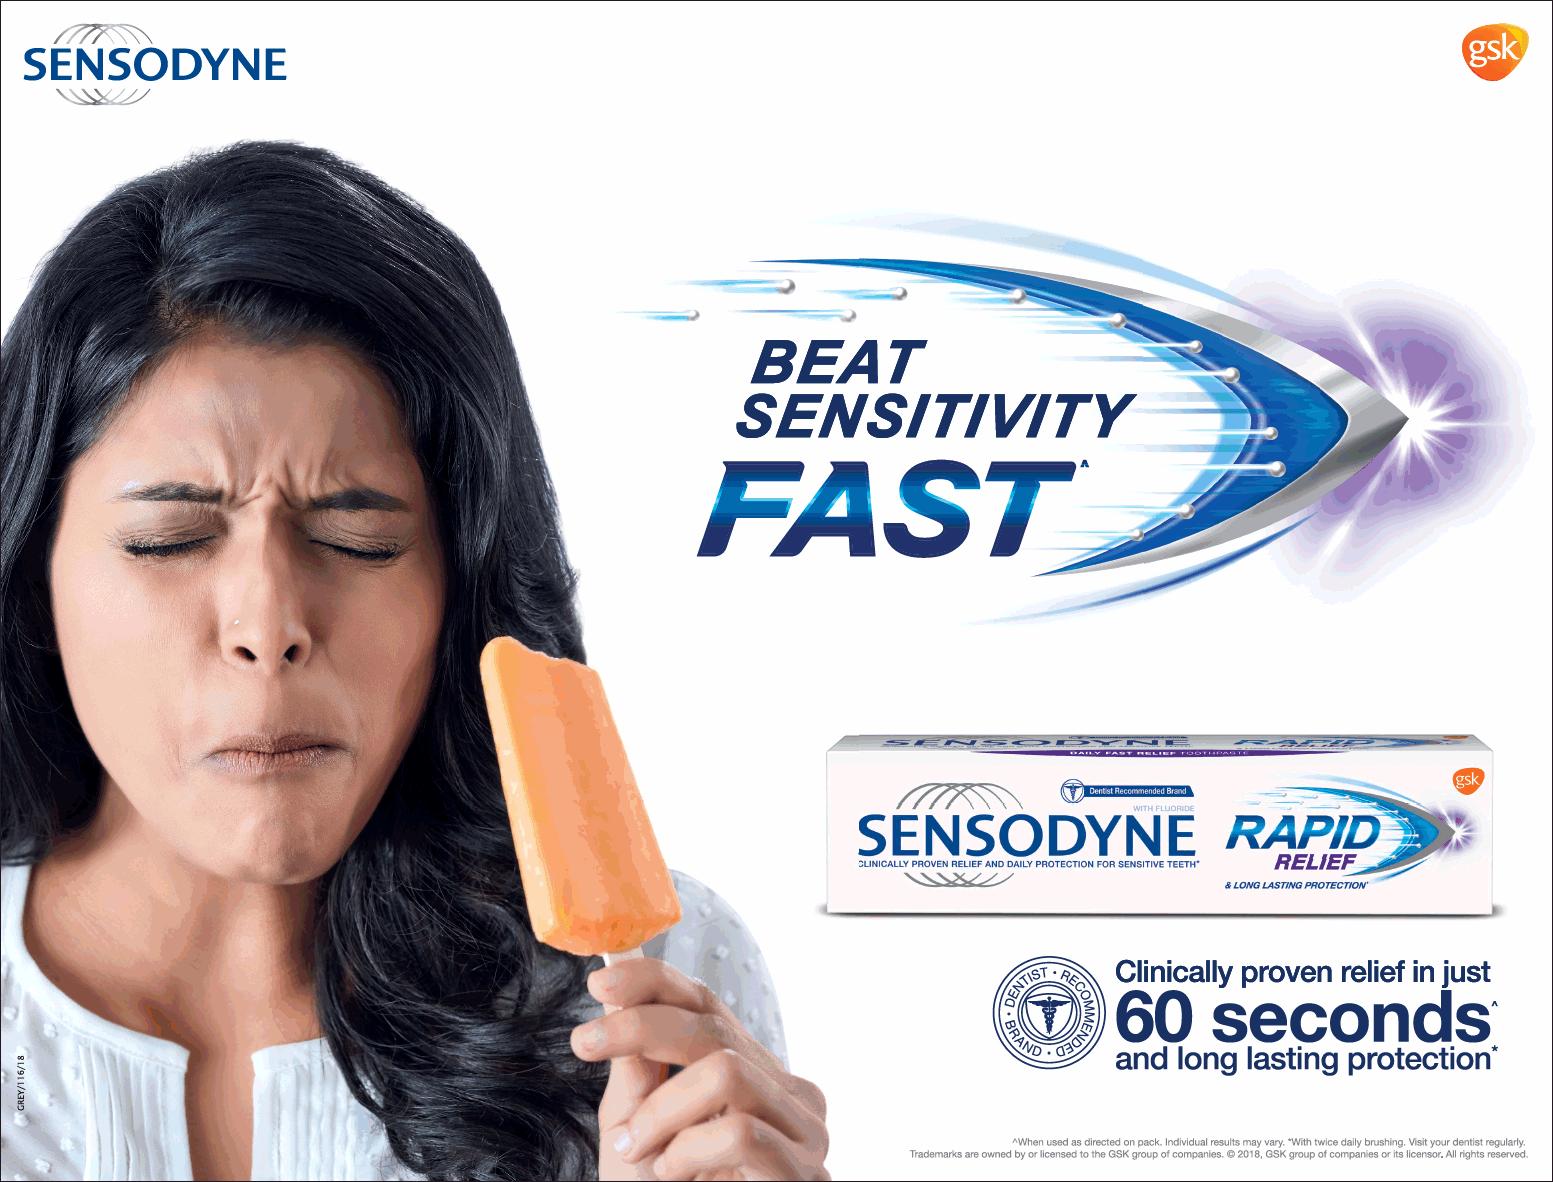 Sensodyne Beat Sensitivity Fast Sensodyne Rapid Relief Ad